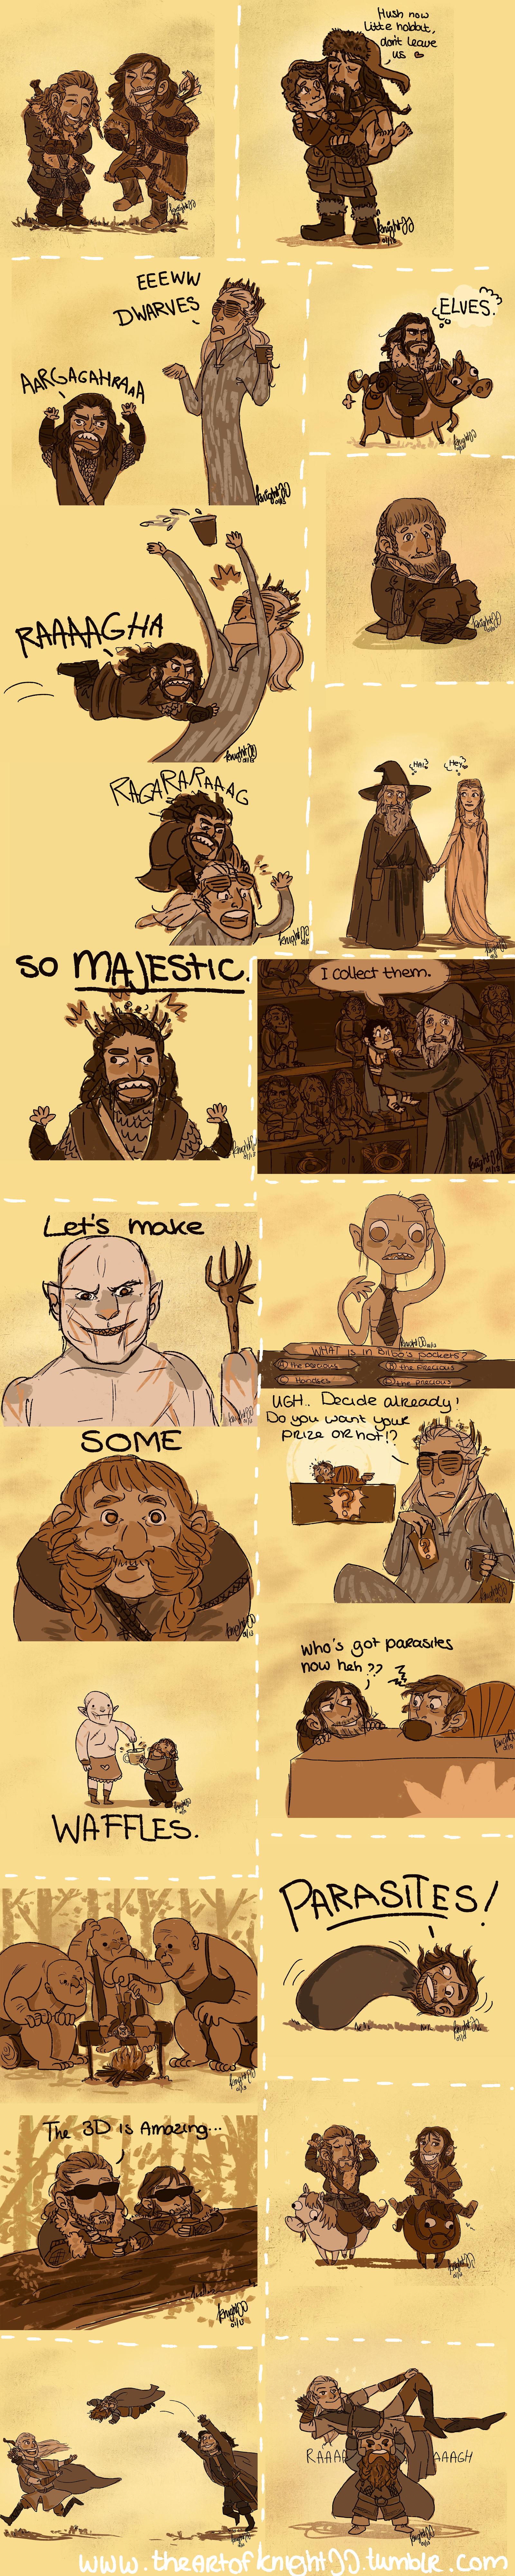 Hobbit Tumblr dump! by knightJJ